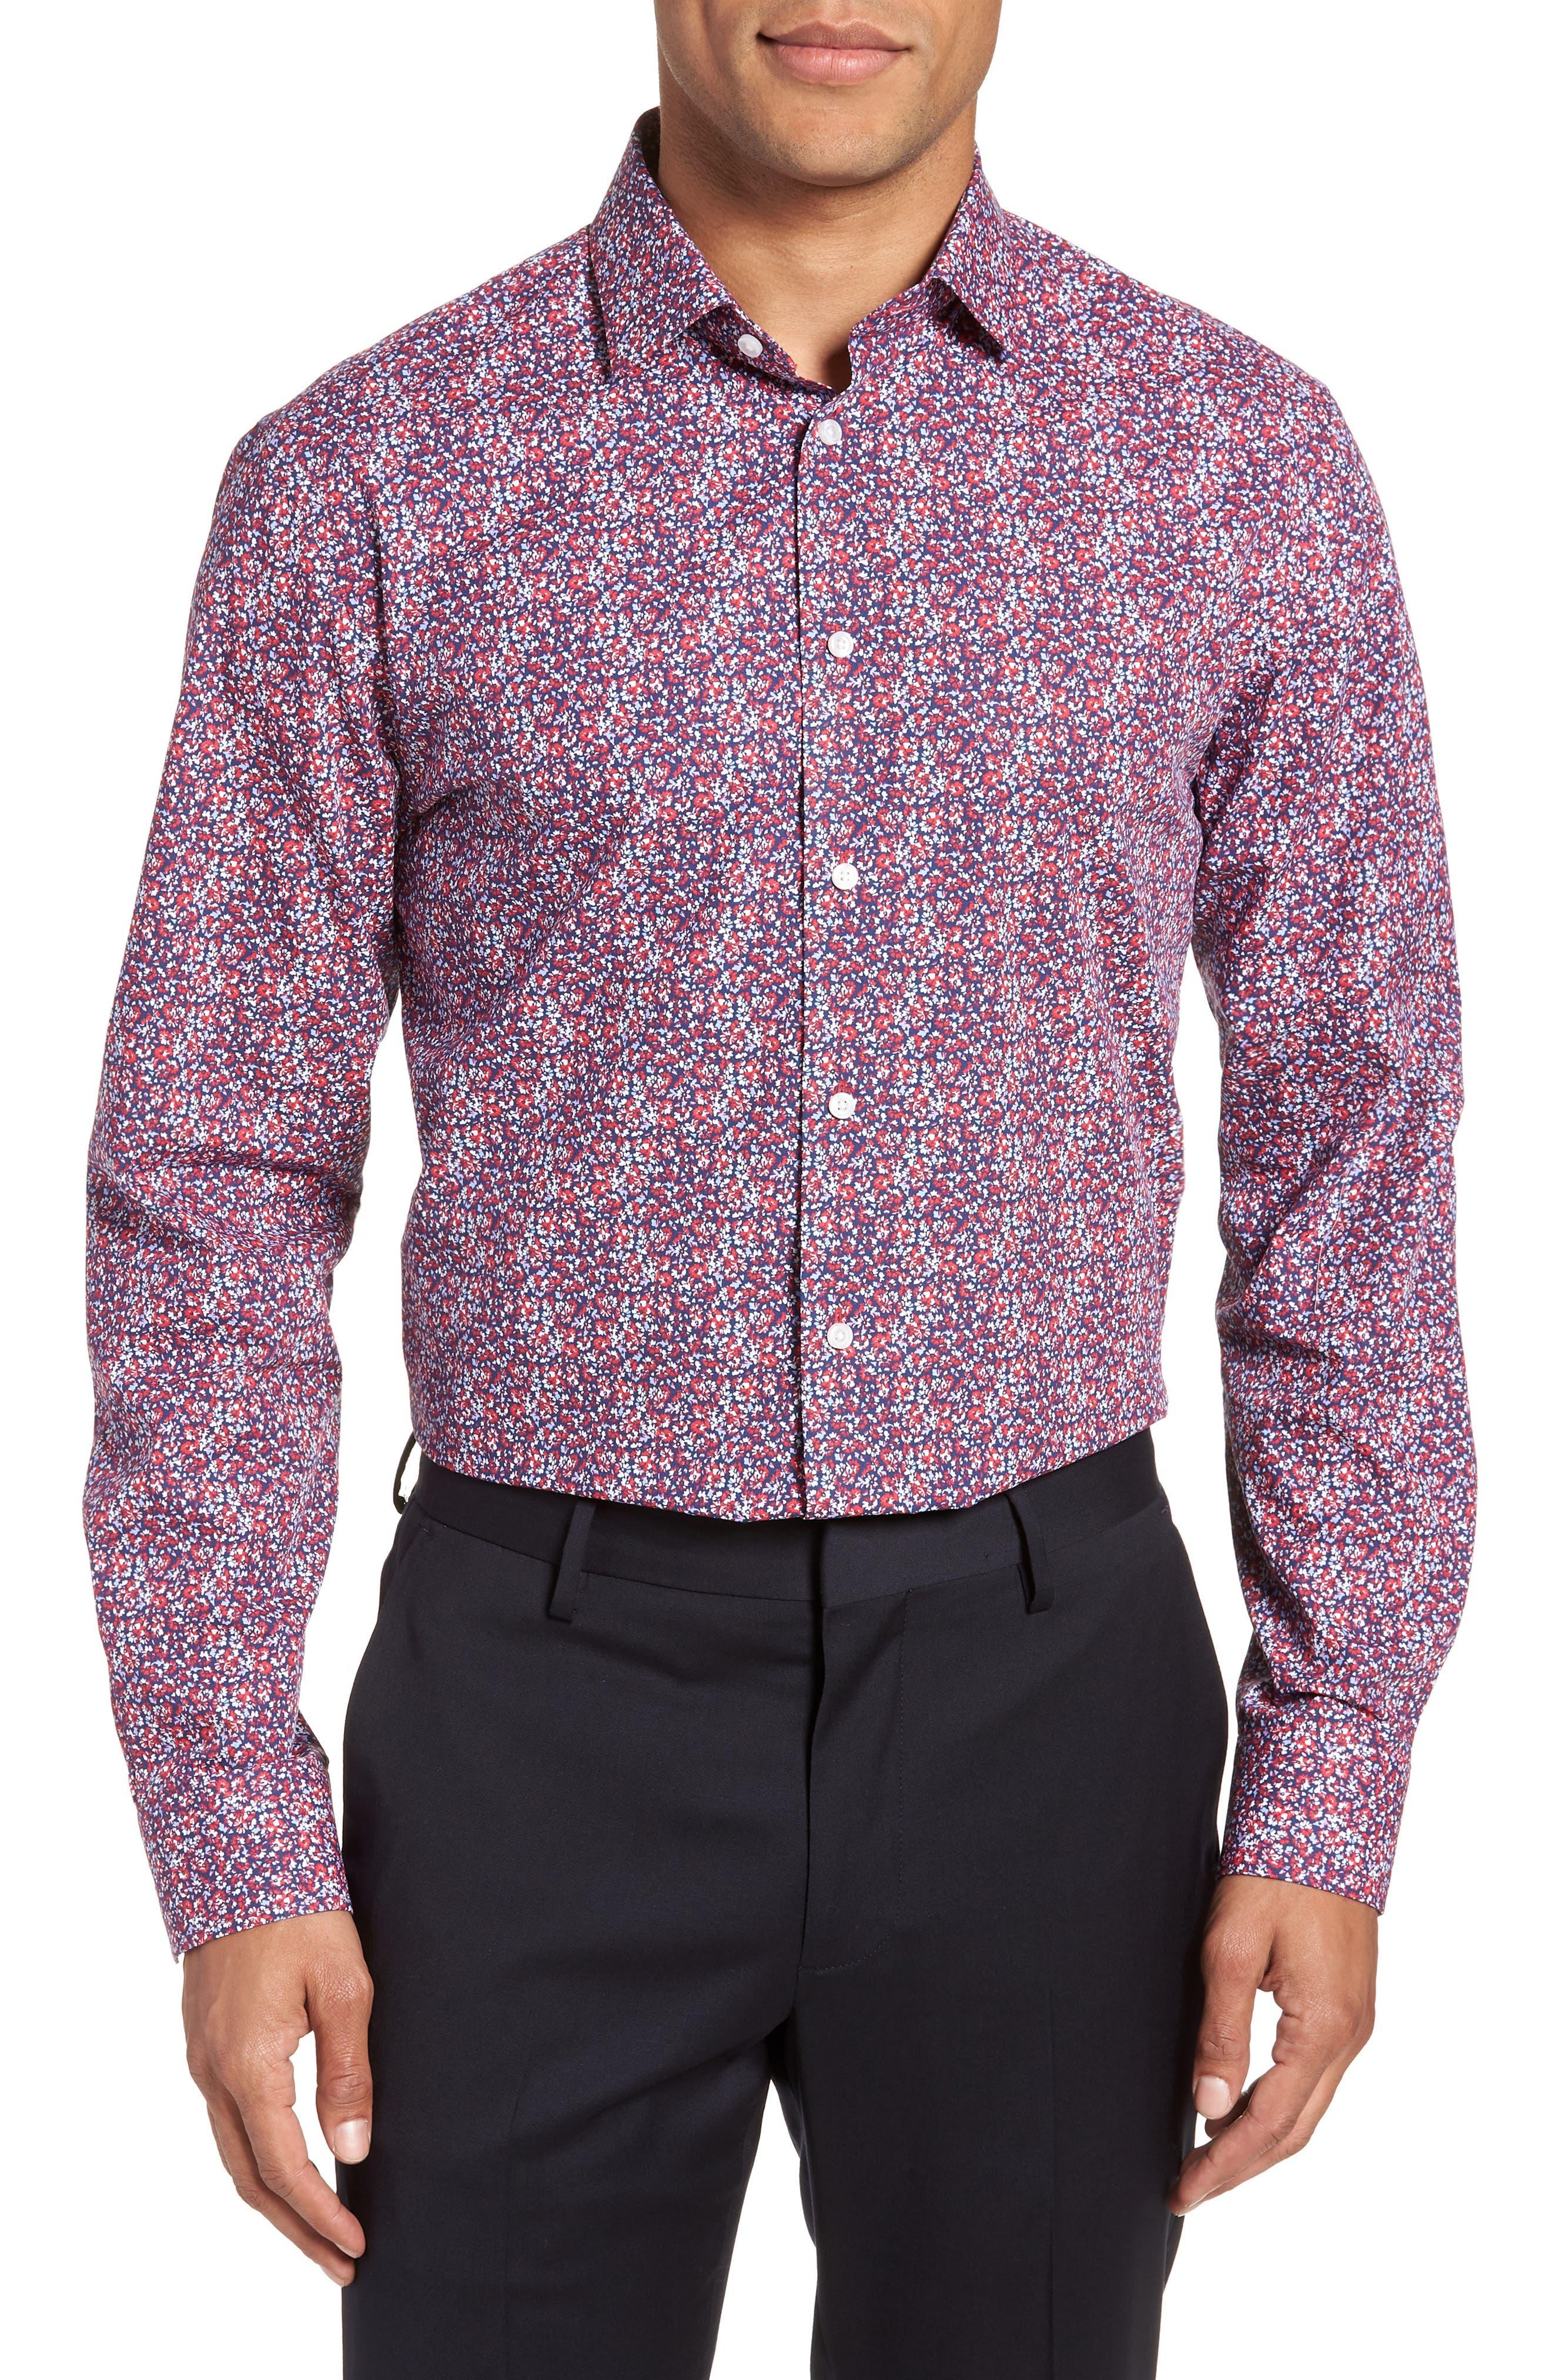 Calibrate Trim Fit Floral Dress Shirt